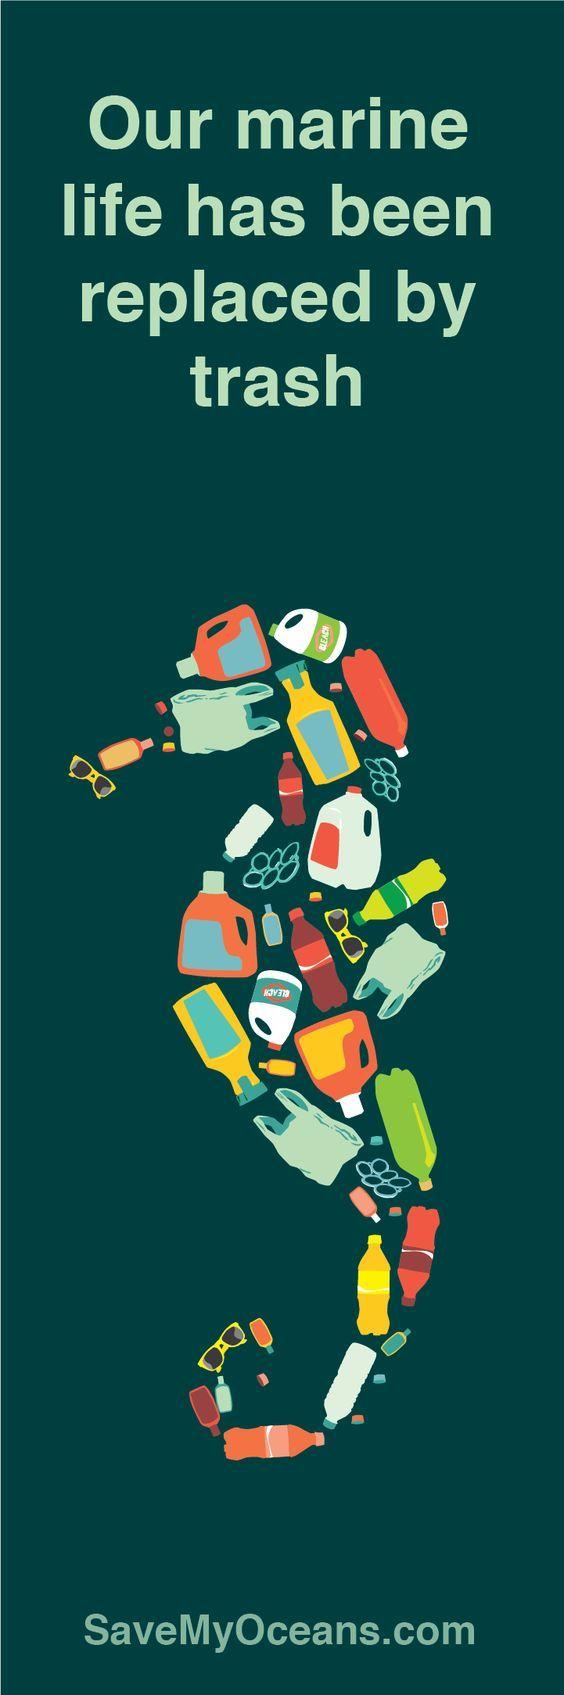 Help save this planet! Go plastic free - Plastik frei!